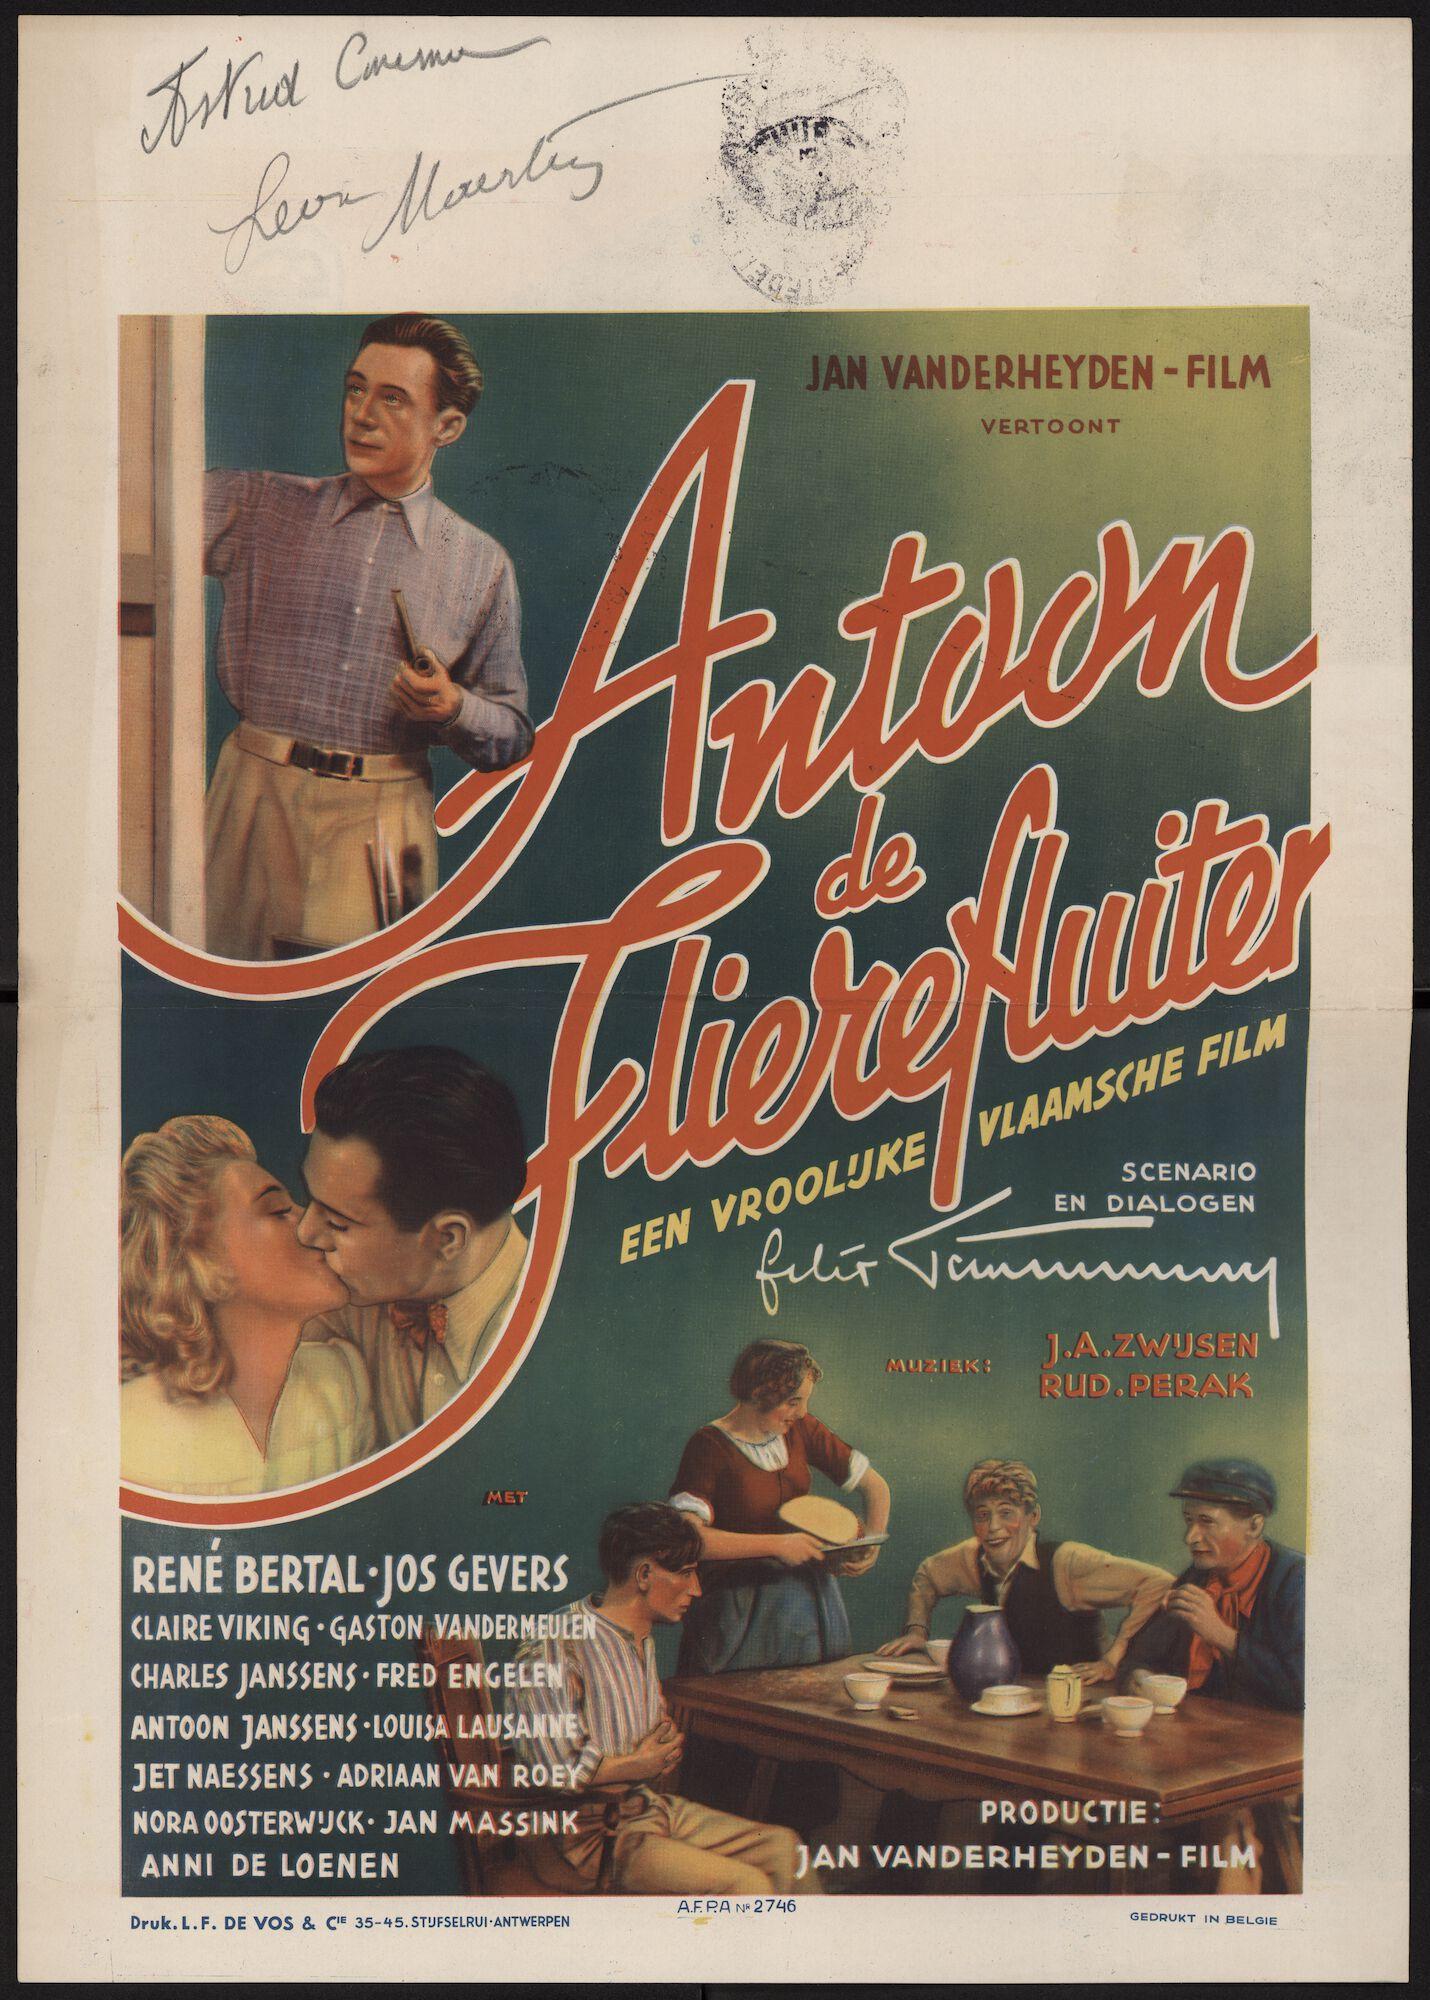 Antoon de flierefluiter, Astrid cinema, Gent, 1943